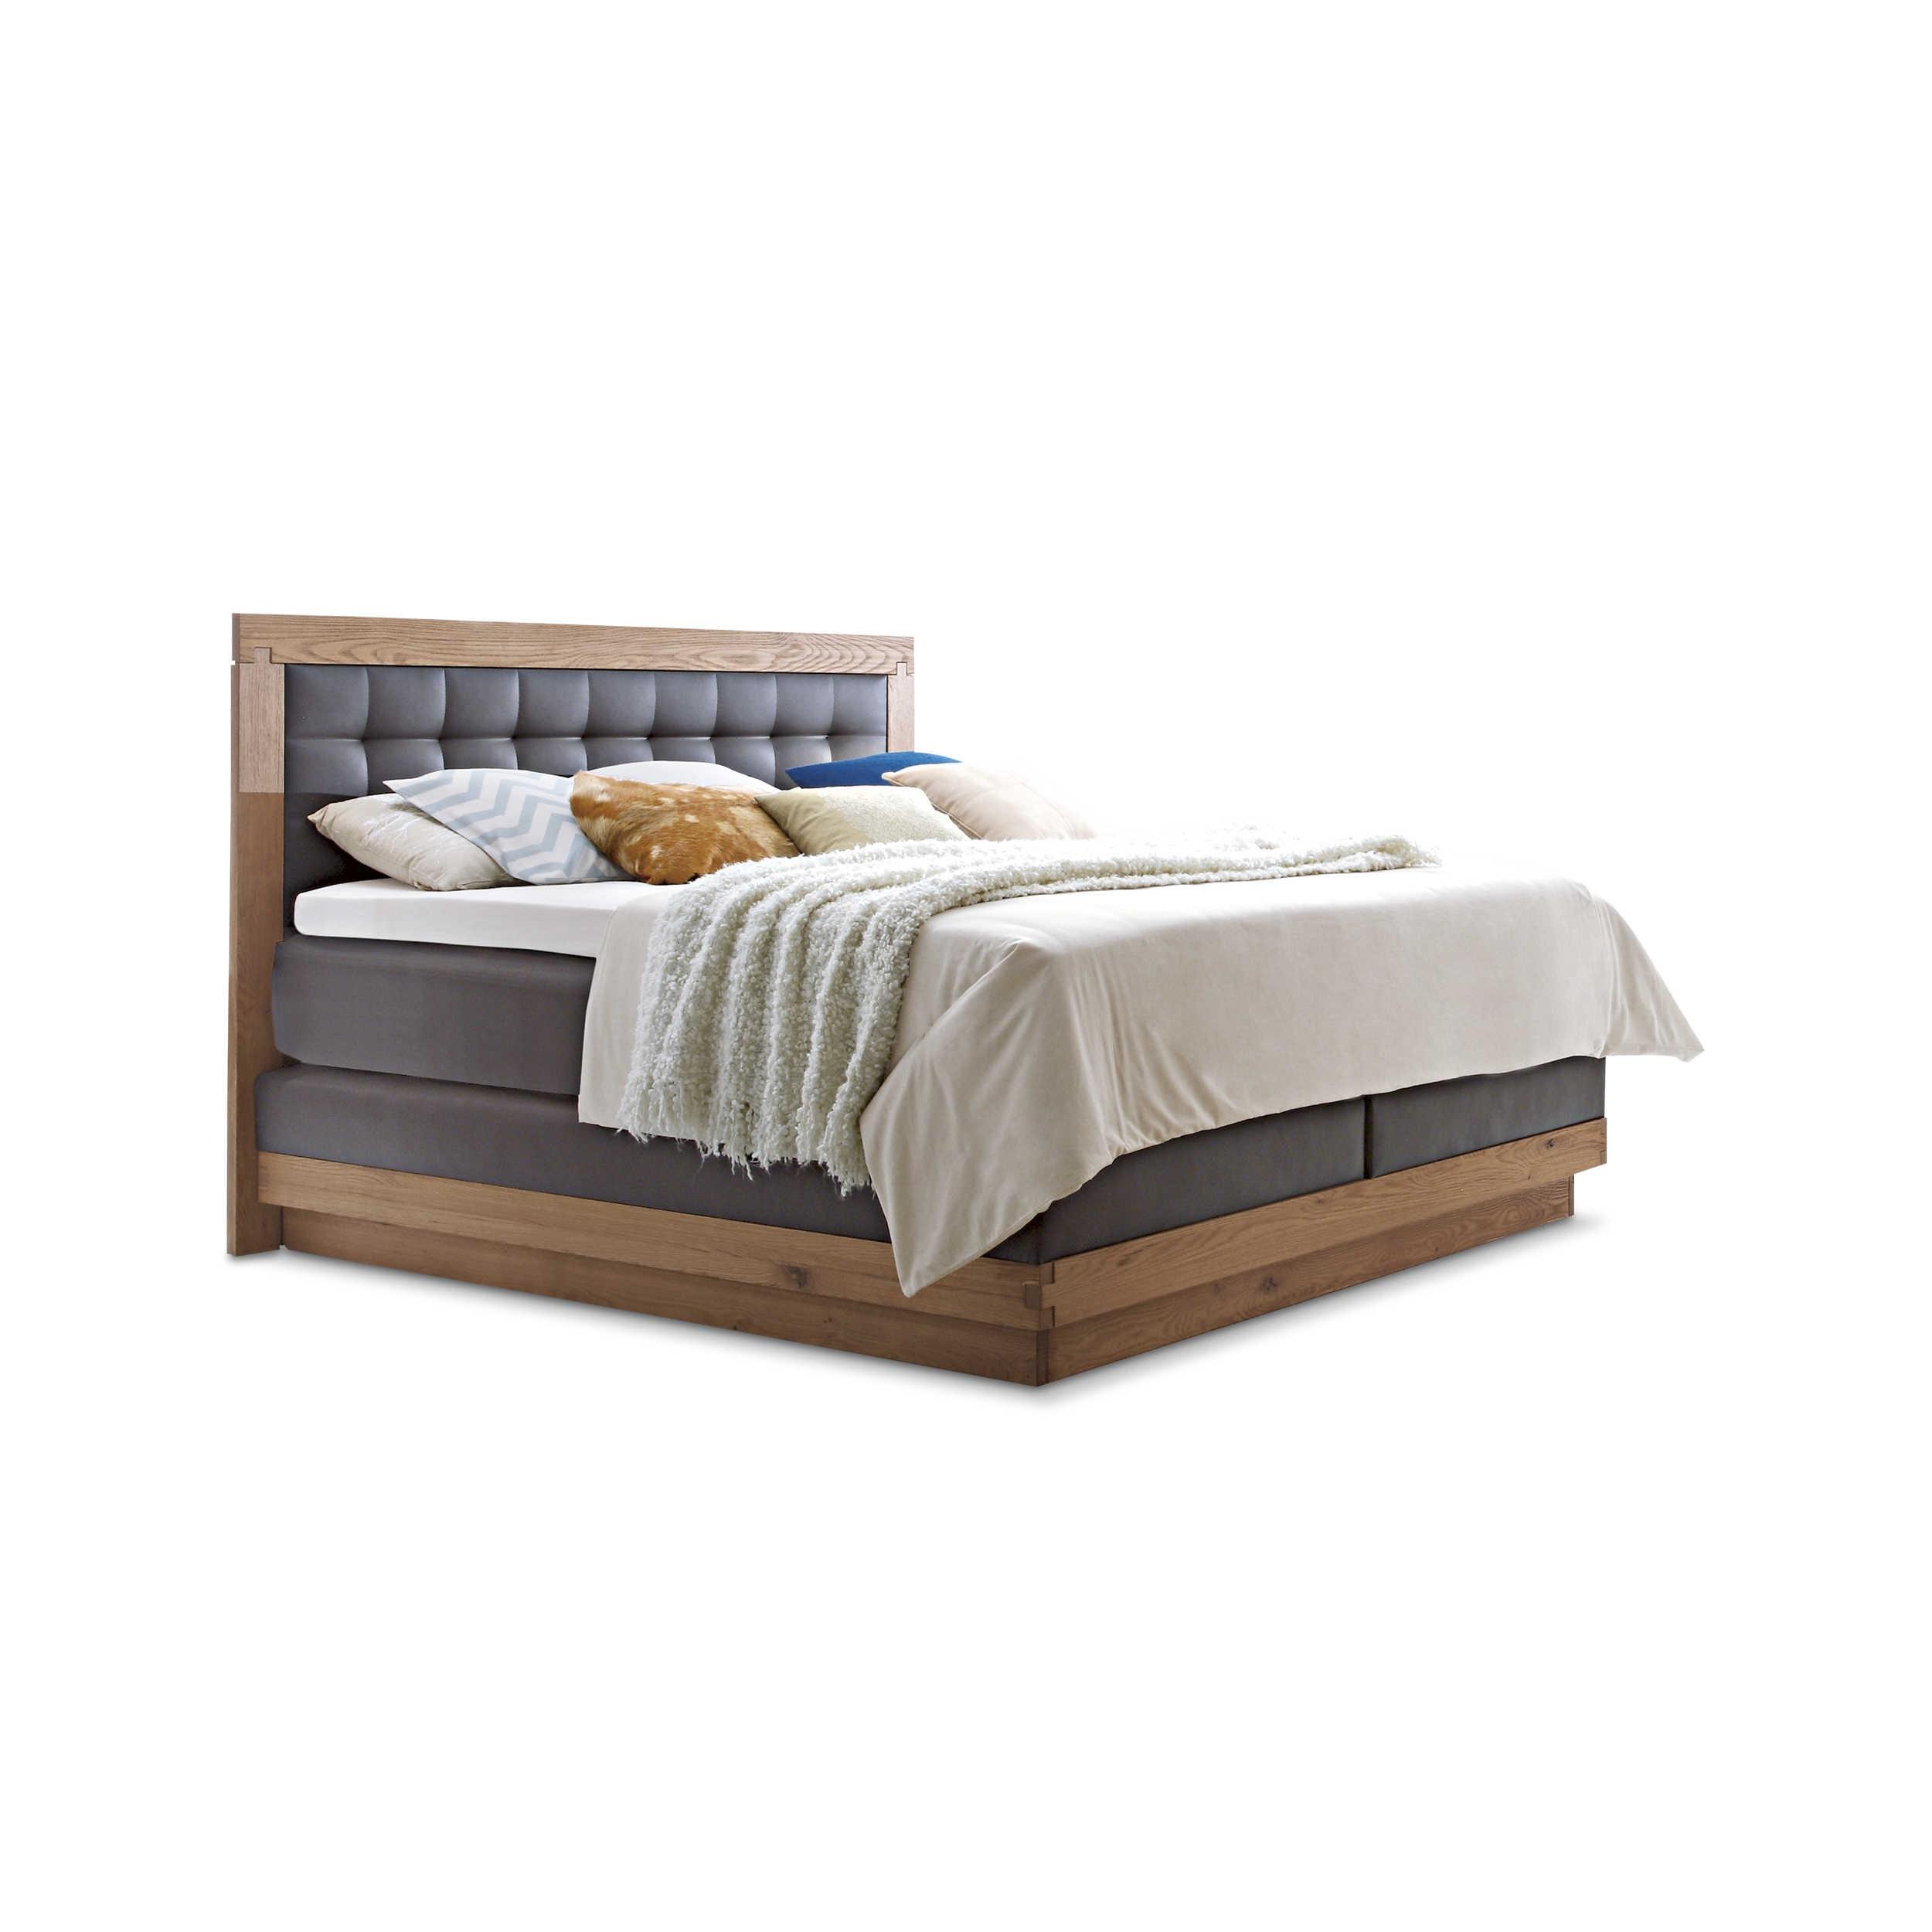 hasena boxspringbett massiva 180 x 200 cm eiche holz online kaufen bei woonio. Black Bedroom Furniture Sets. Home Design Ideas